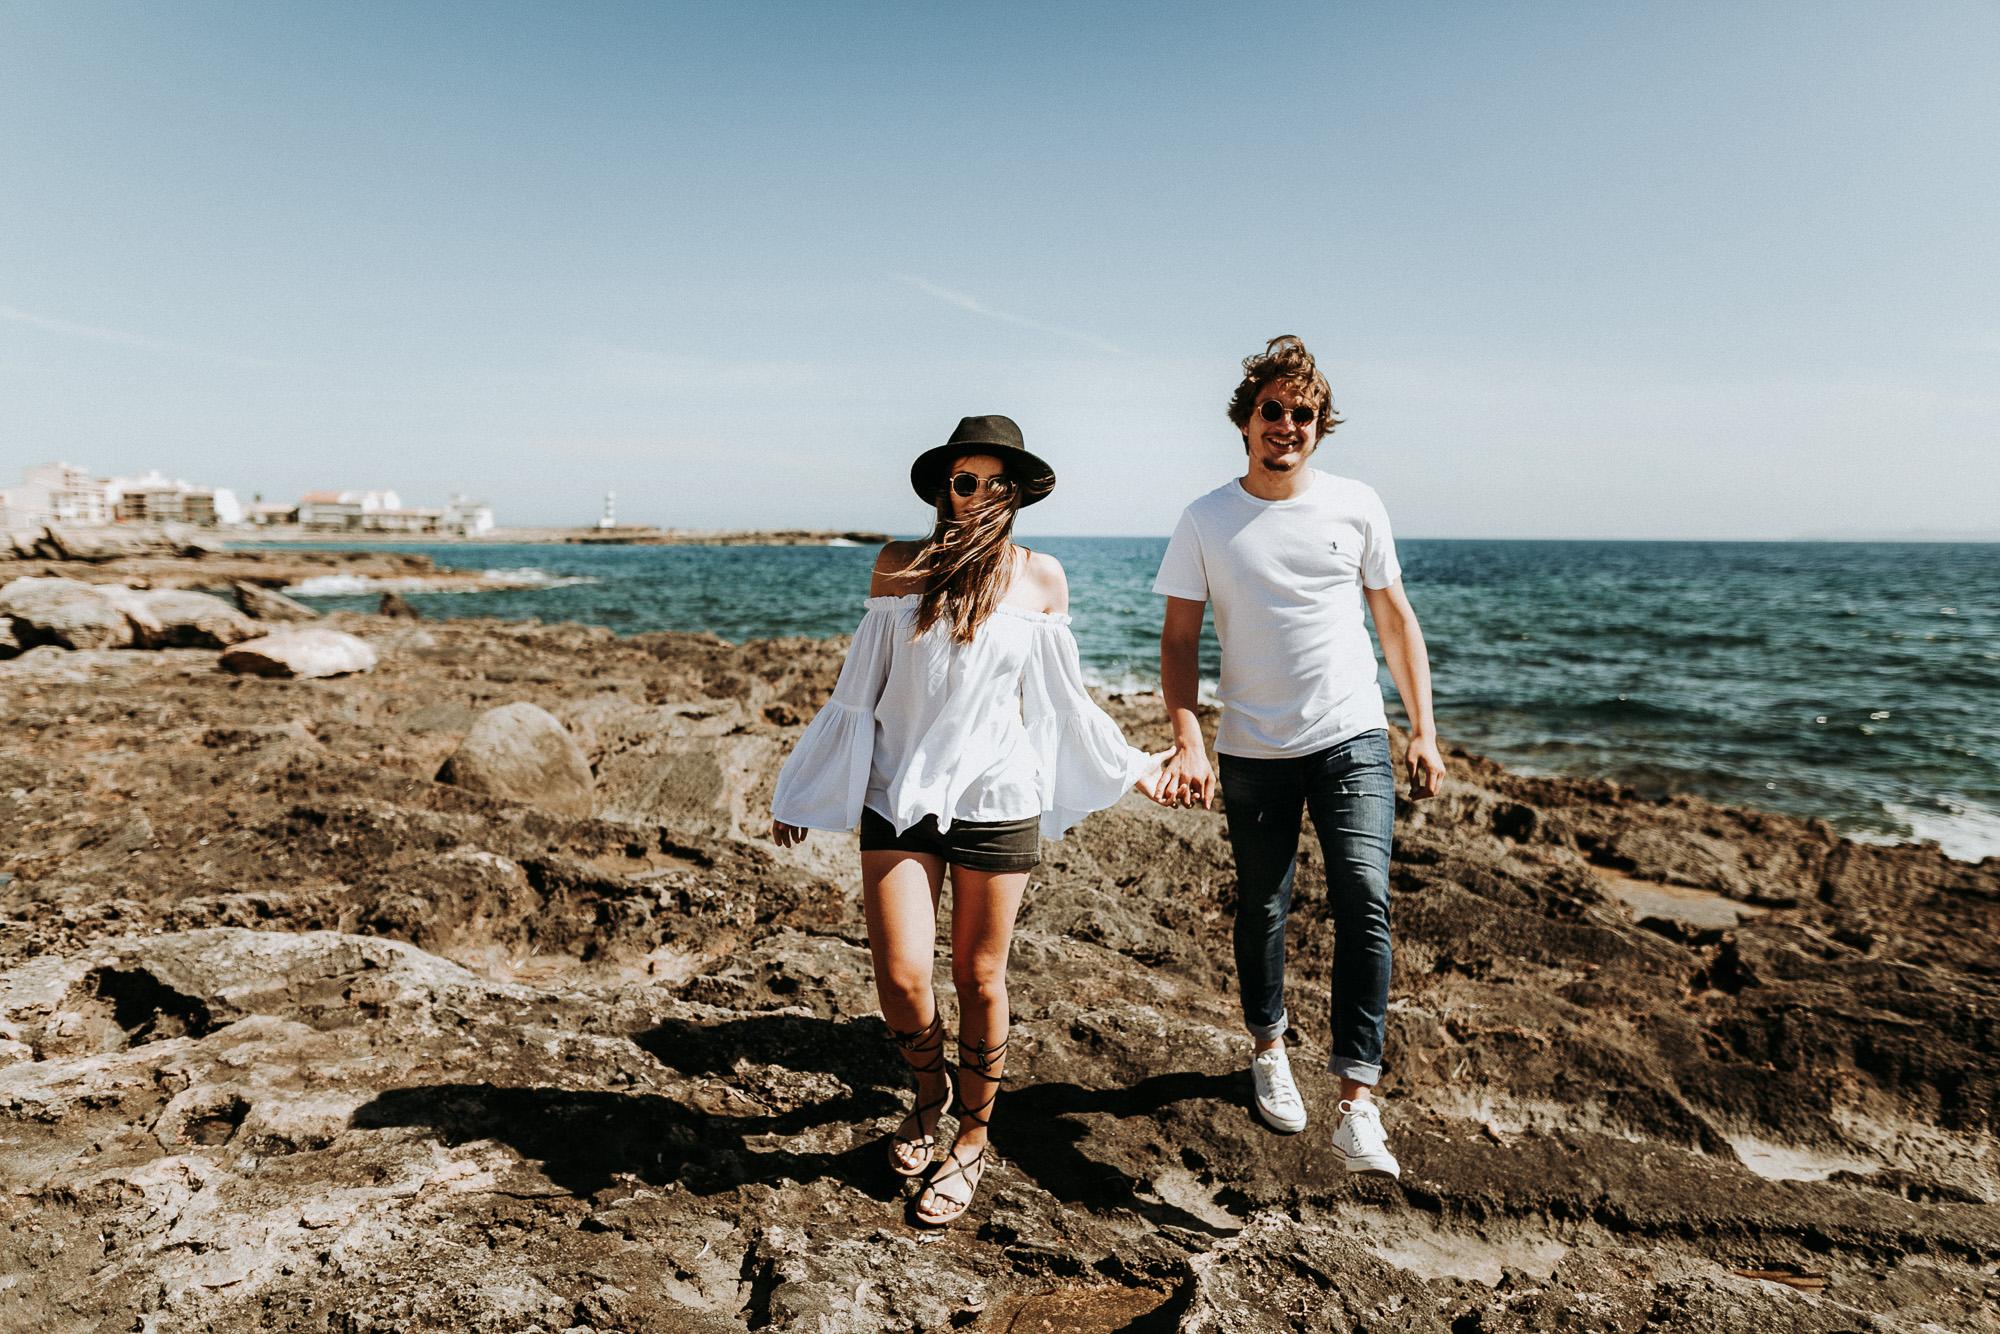 DanielaMarquardtPhotography_wedding_elopement_mallorca_spain_stjordi_sessalines_marinaandxavi50